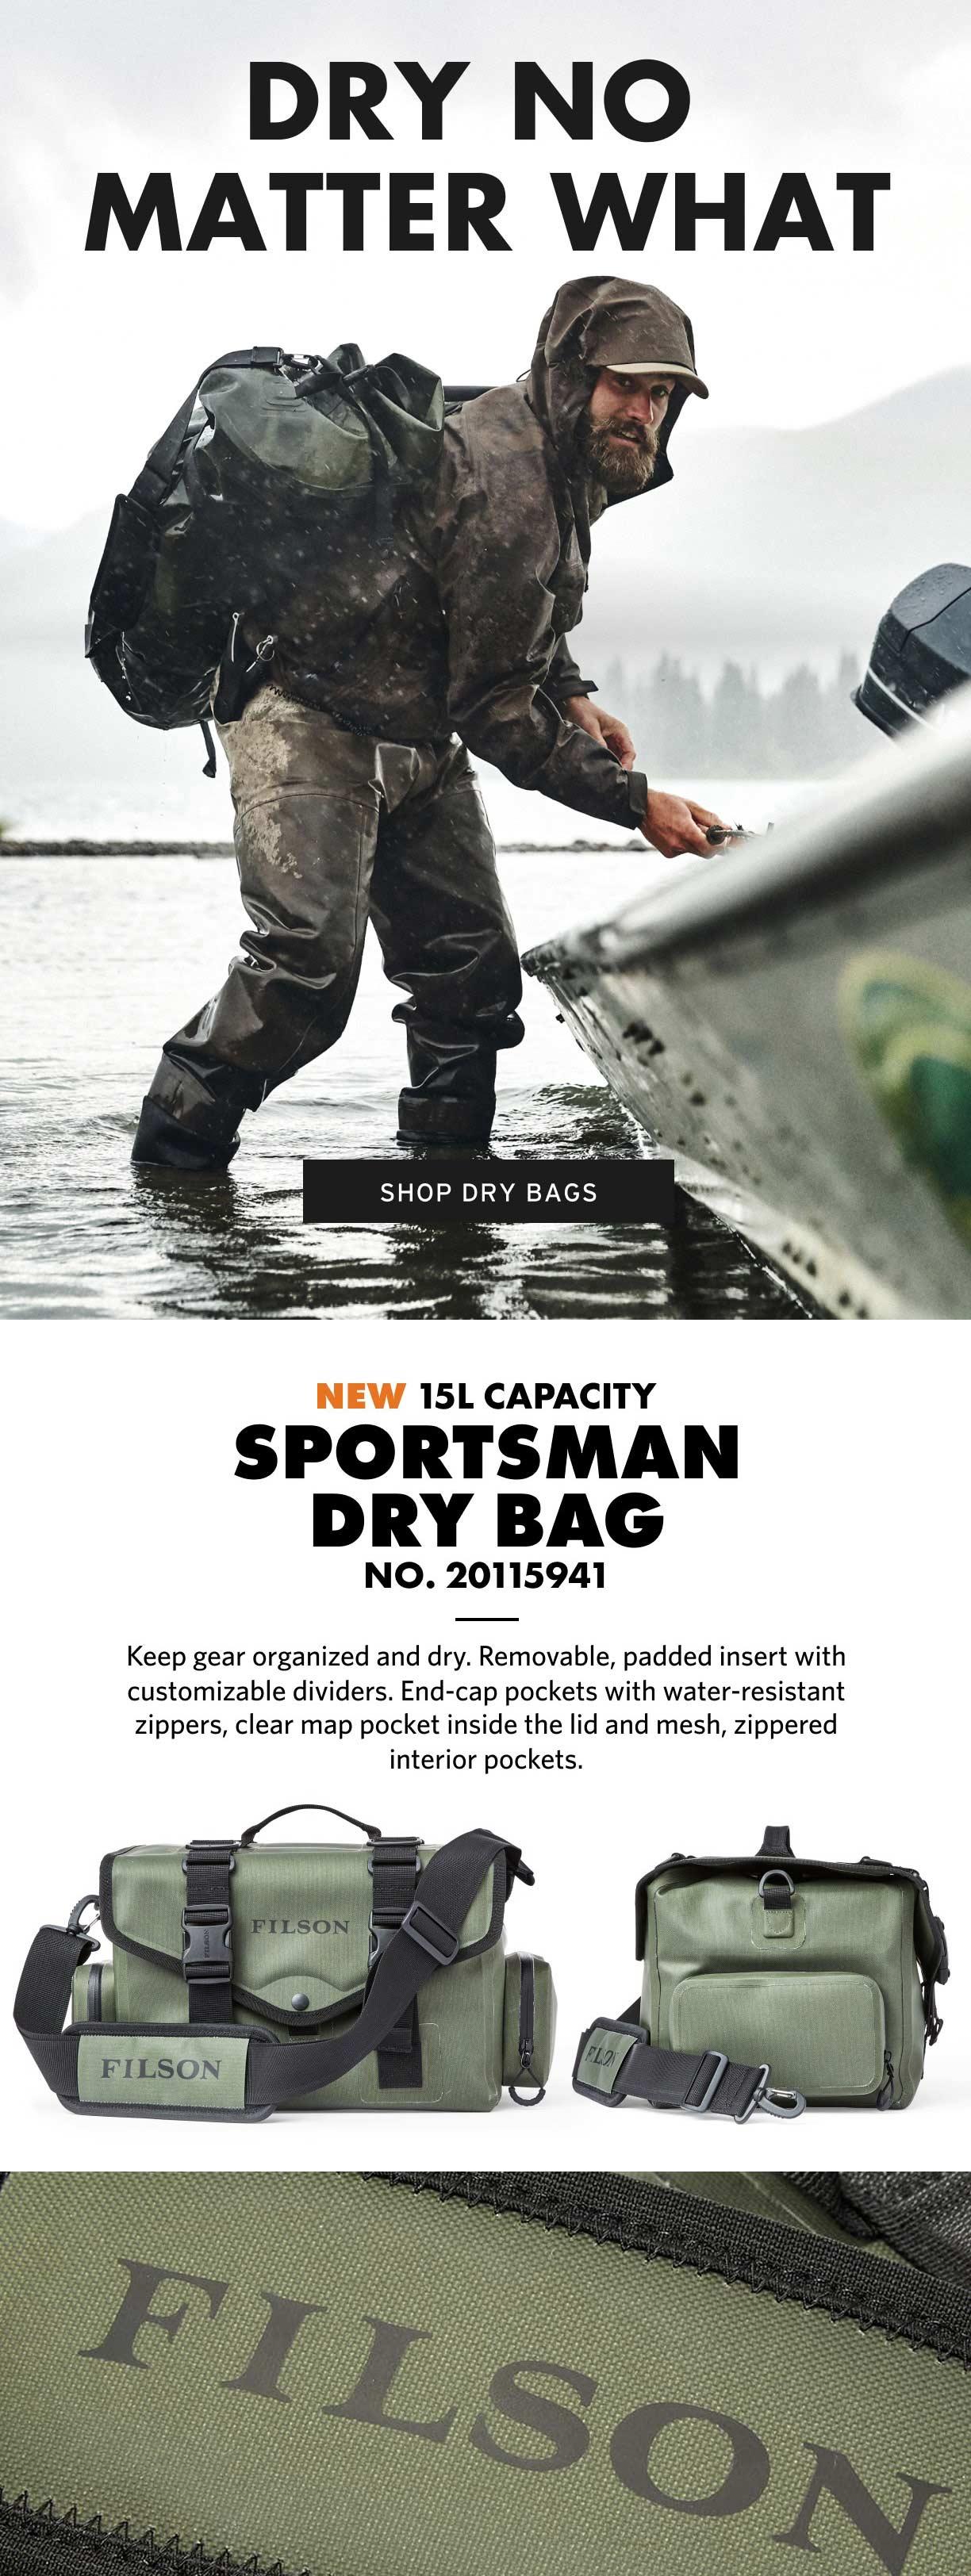 Filson Sportsman Dry Bag Productinformation